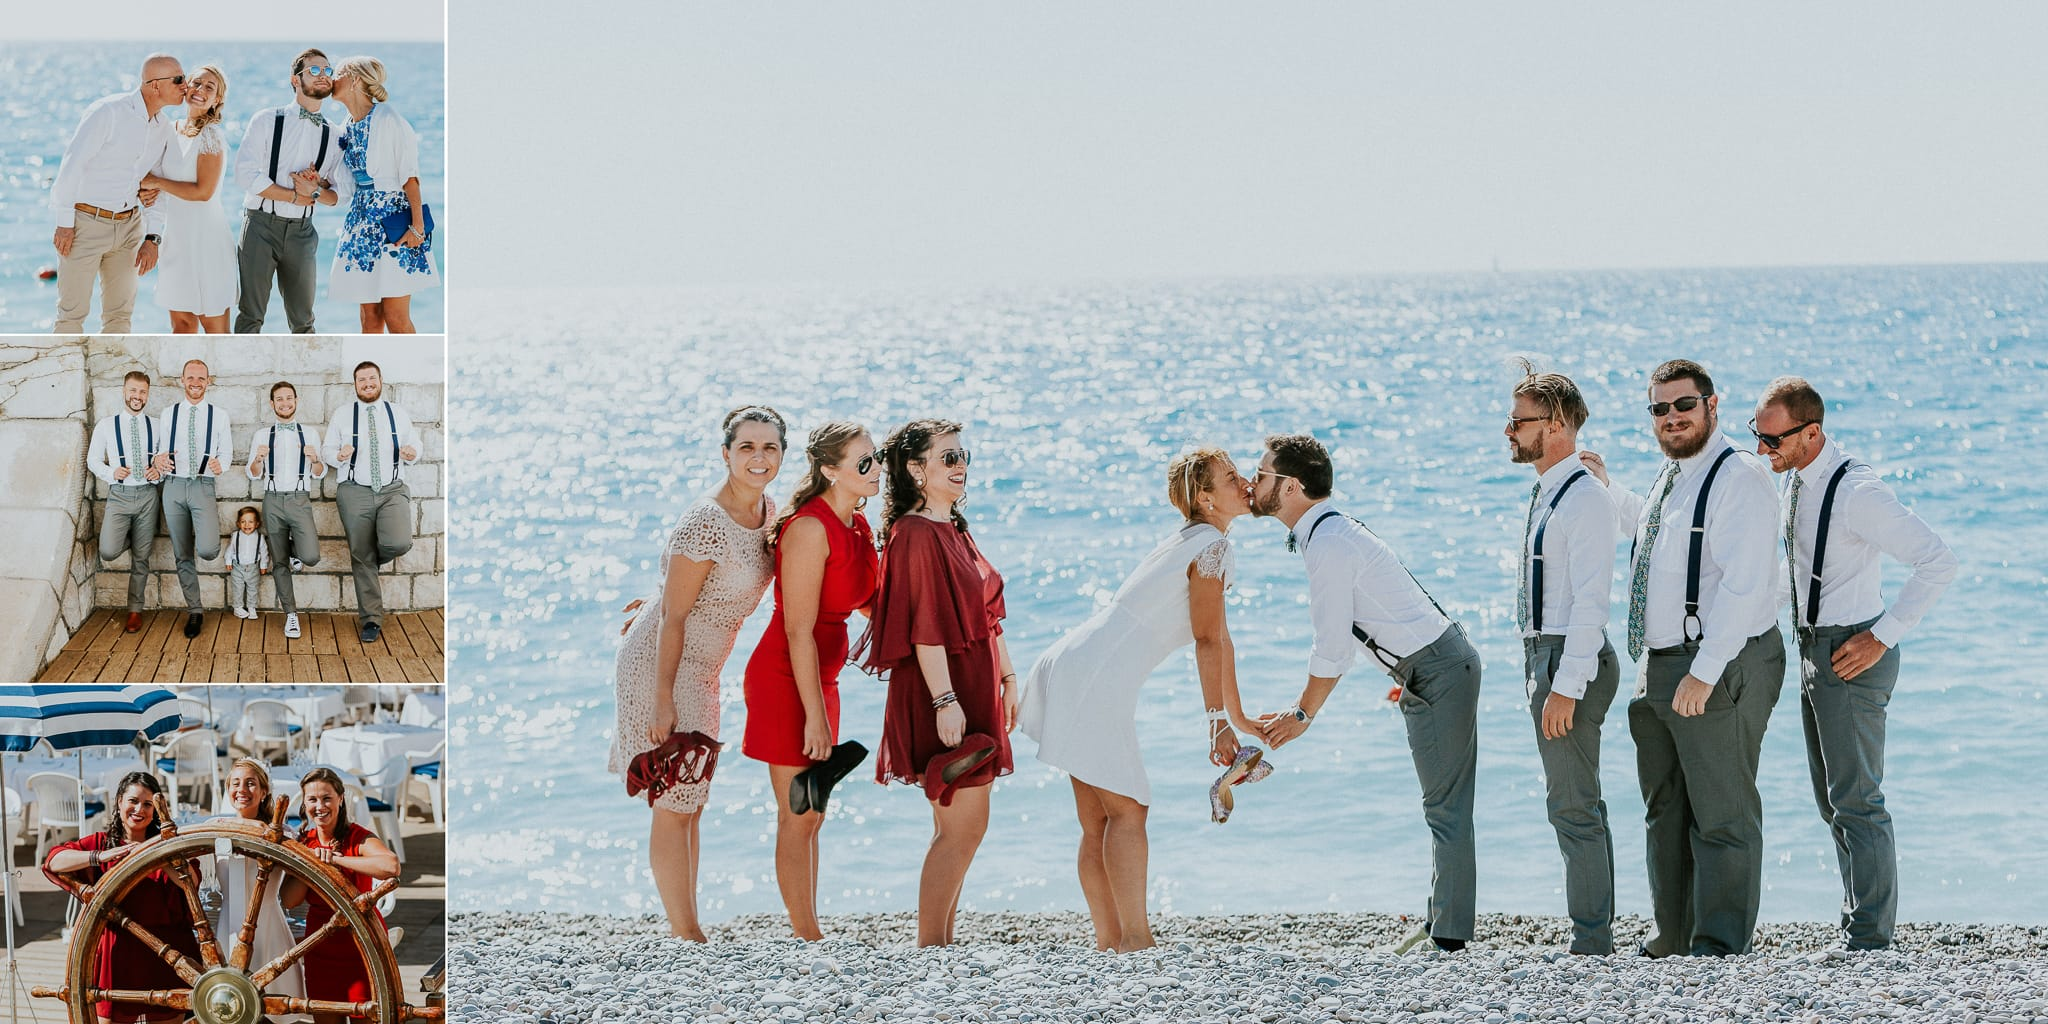 Costi-Moiceanu-Photographer-CM-Photography-Wedding-Mariage-French-Riviera-Cote-D-Azur-Alpes-Maritimes-Weding-Album-Design-3